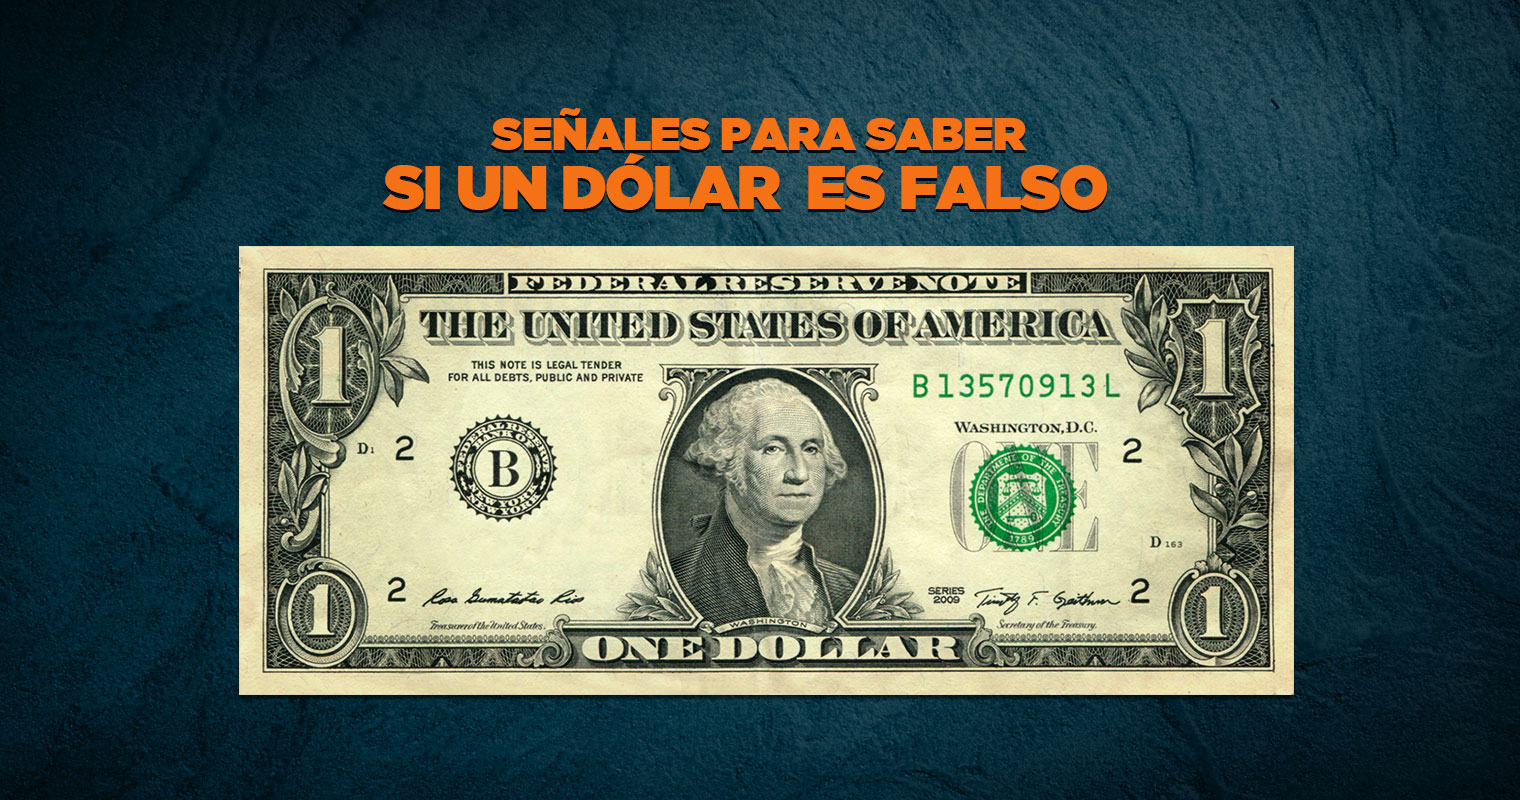 INFOGRAFÍA: Señales para saber si un dólar es falso